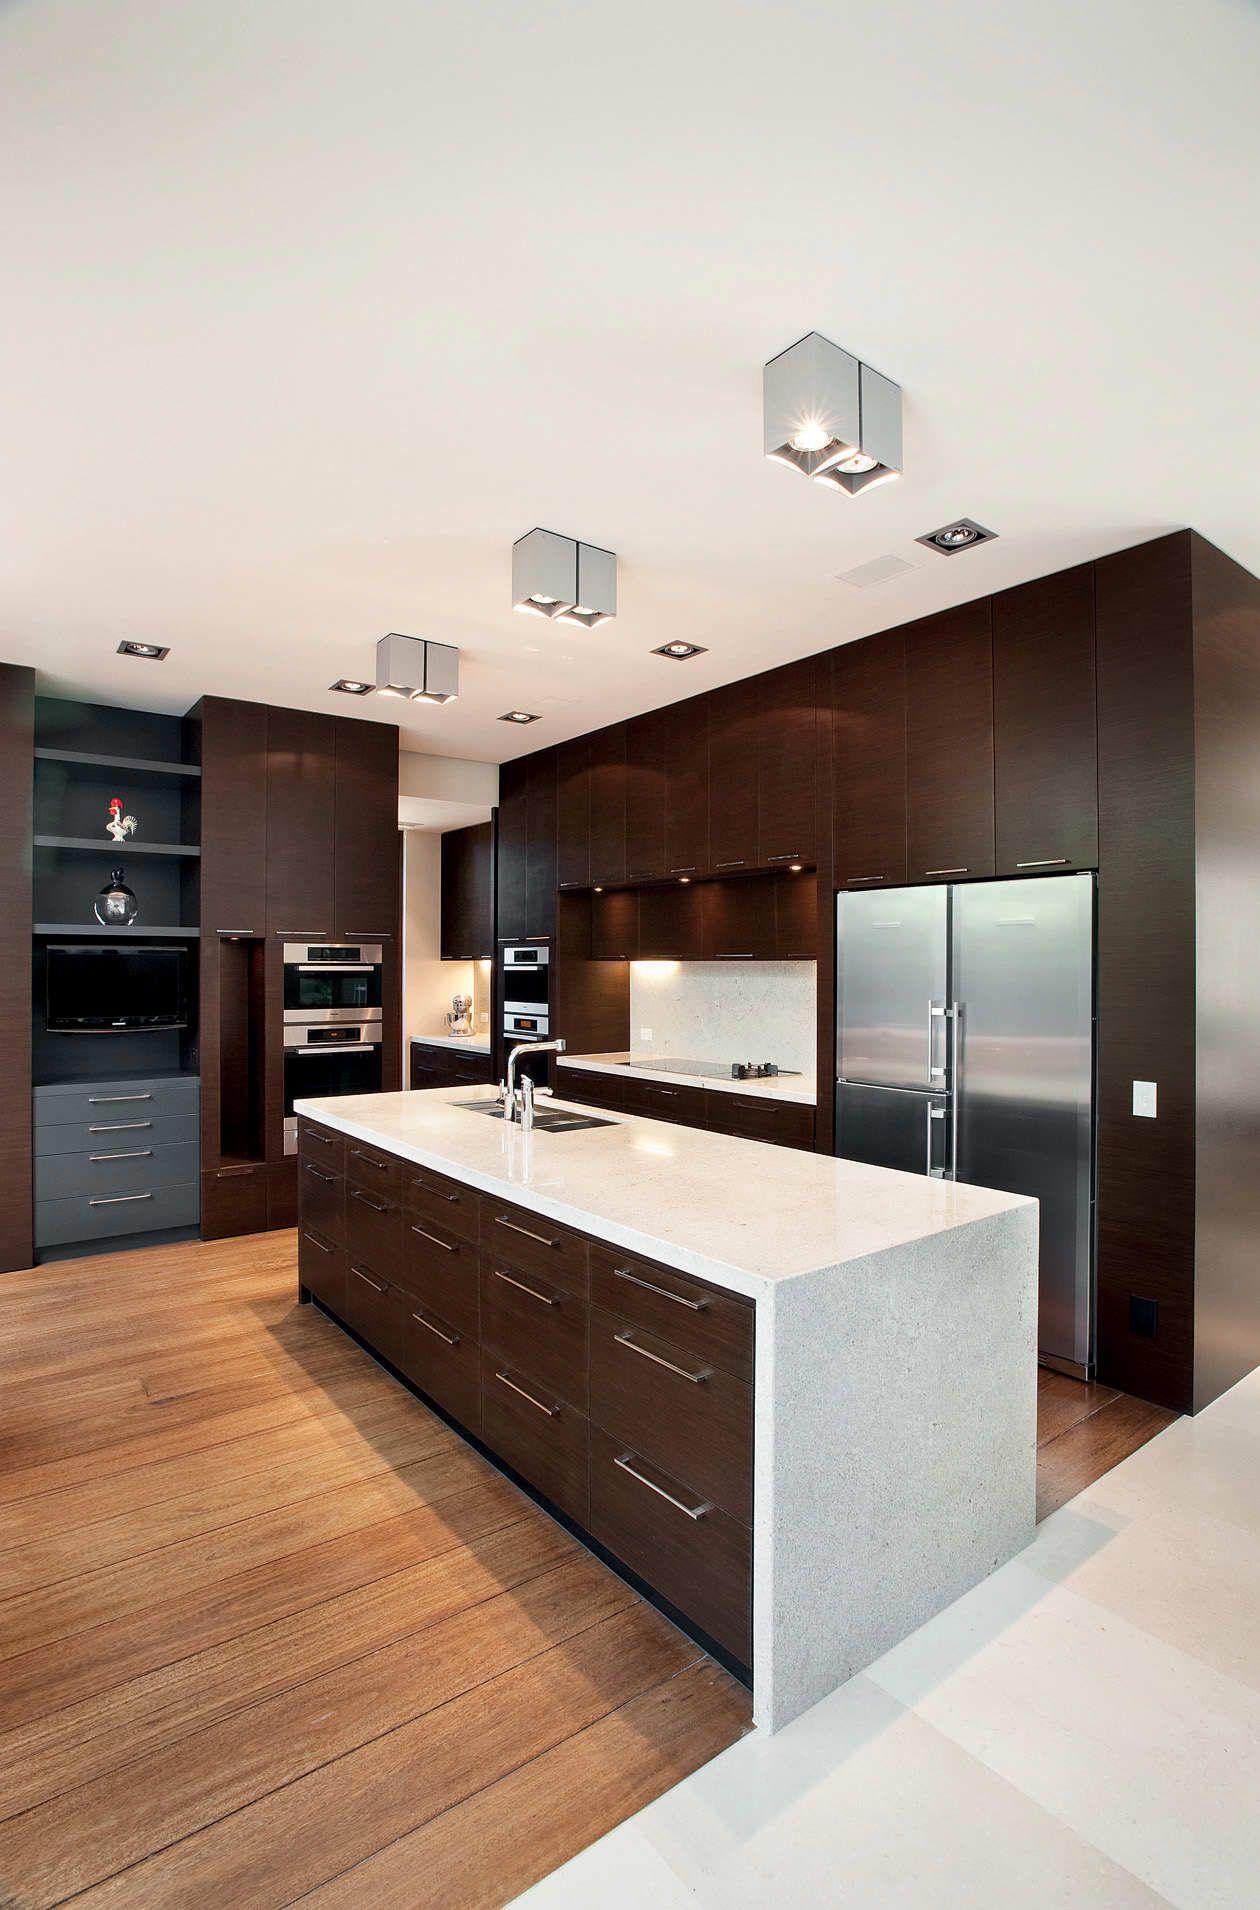 100 idee di cucine moderne con elementi in legno | Pinterest ...